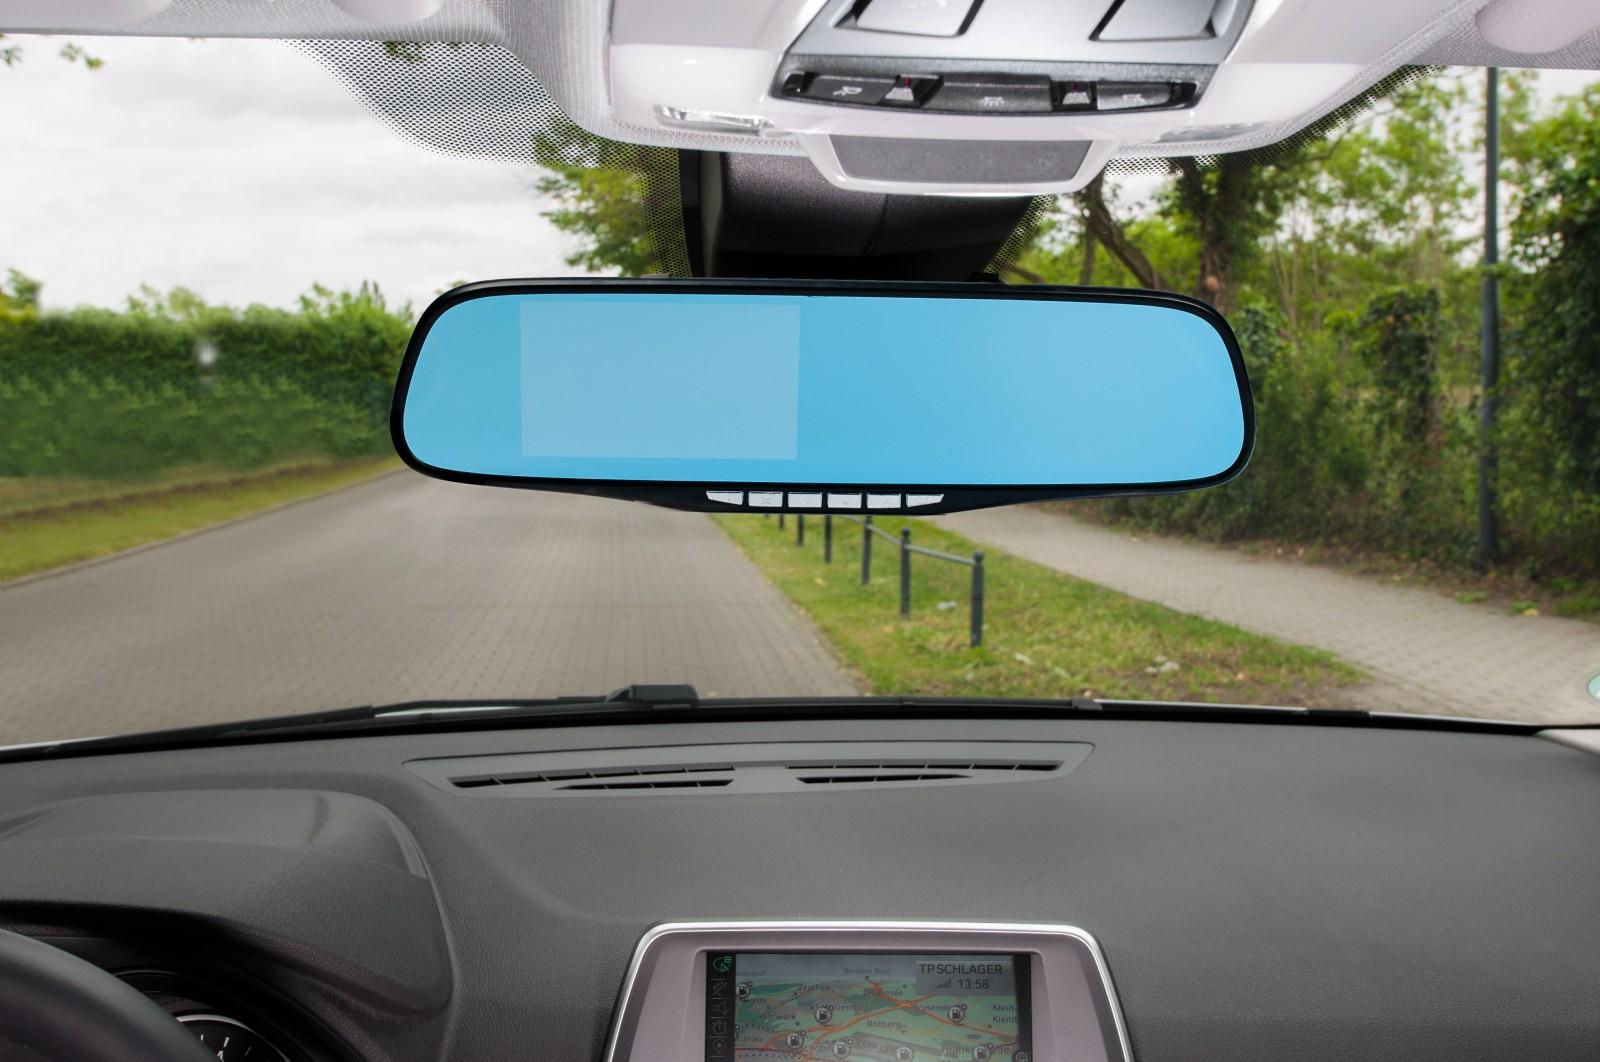 auto dvr r ckspiegel monitor dashcam mit r ckfahrkamera full hd 1080p g sensor. Black Bedroom Furniture Sets. Home Design Ideas